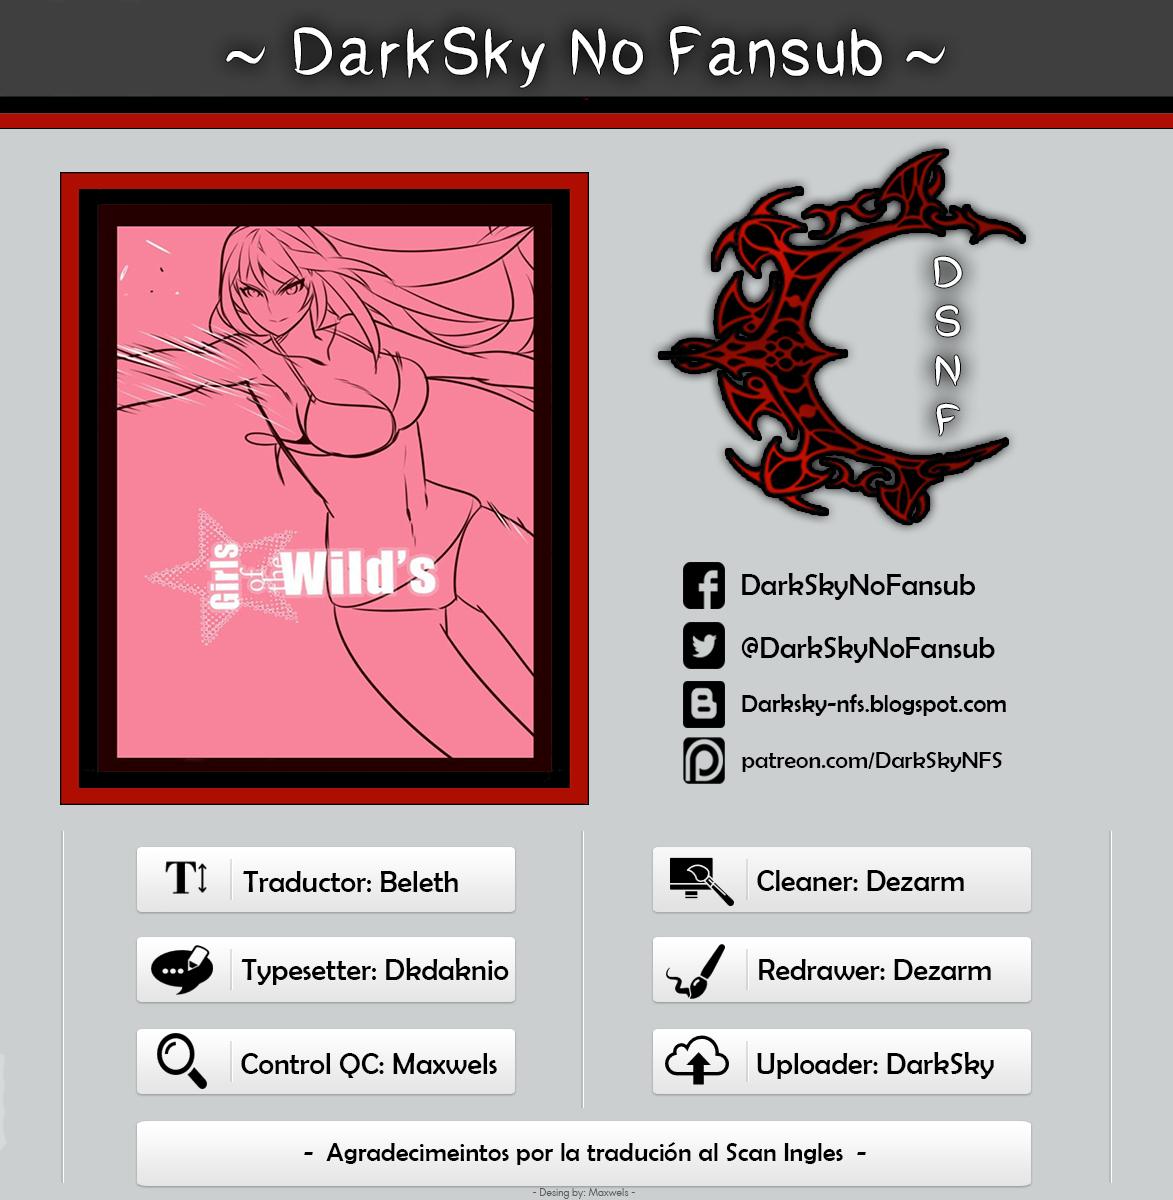 http://c5.ninemanga.com/es_manga/32/416/428942/321311b1a2d186b850844e4197706453.jpg Page 1